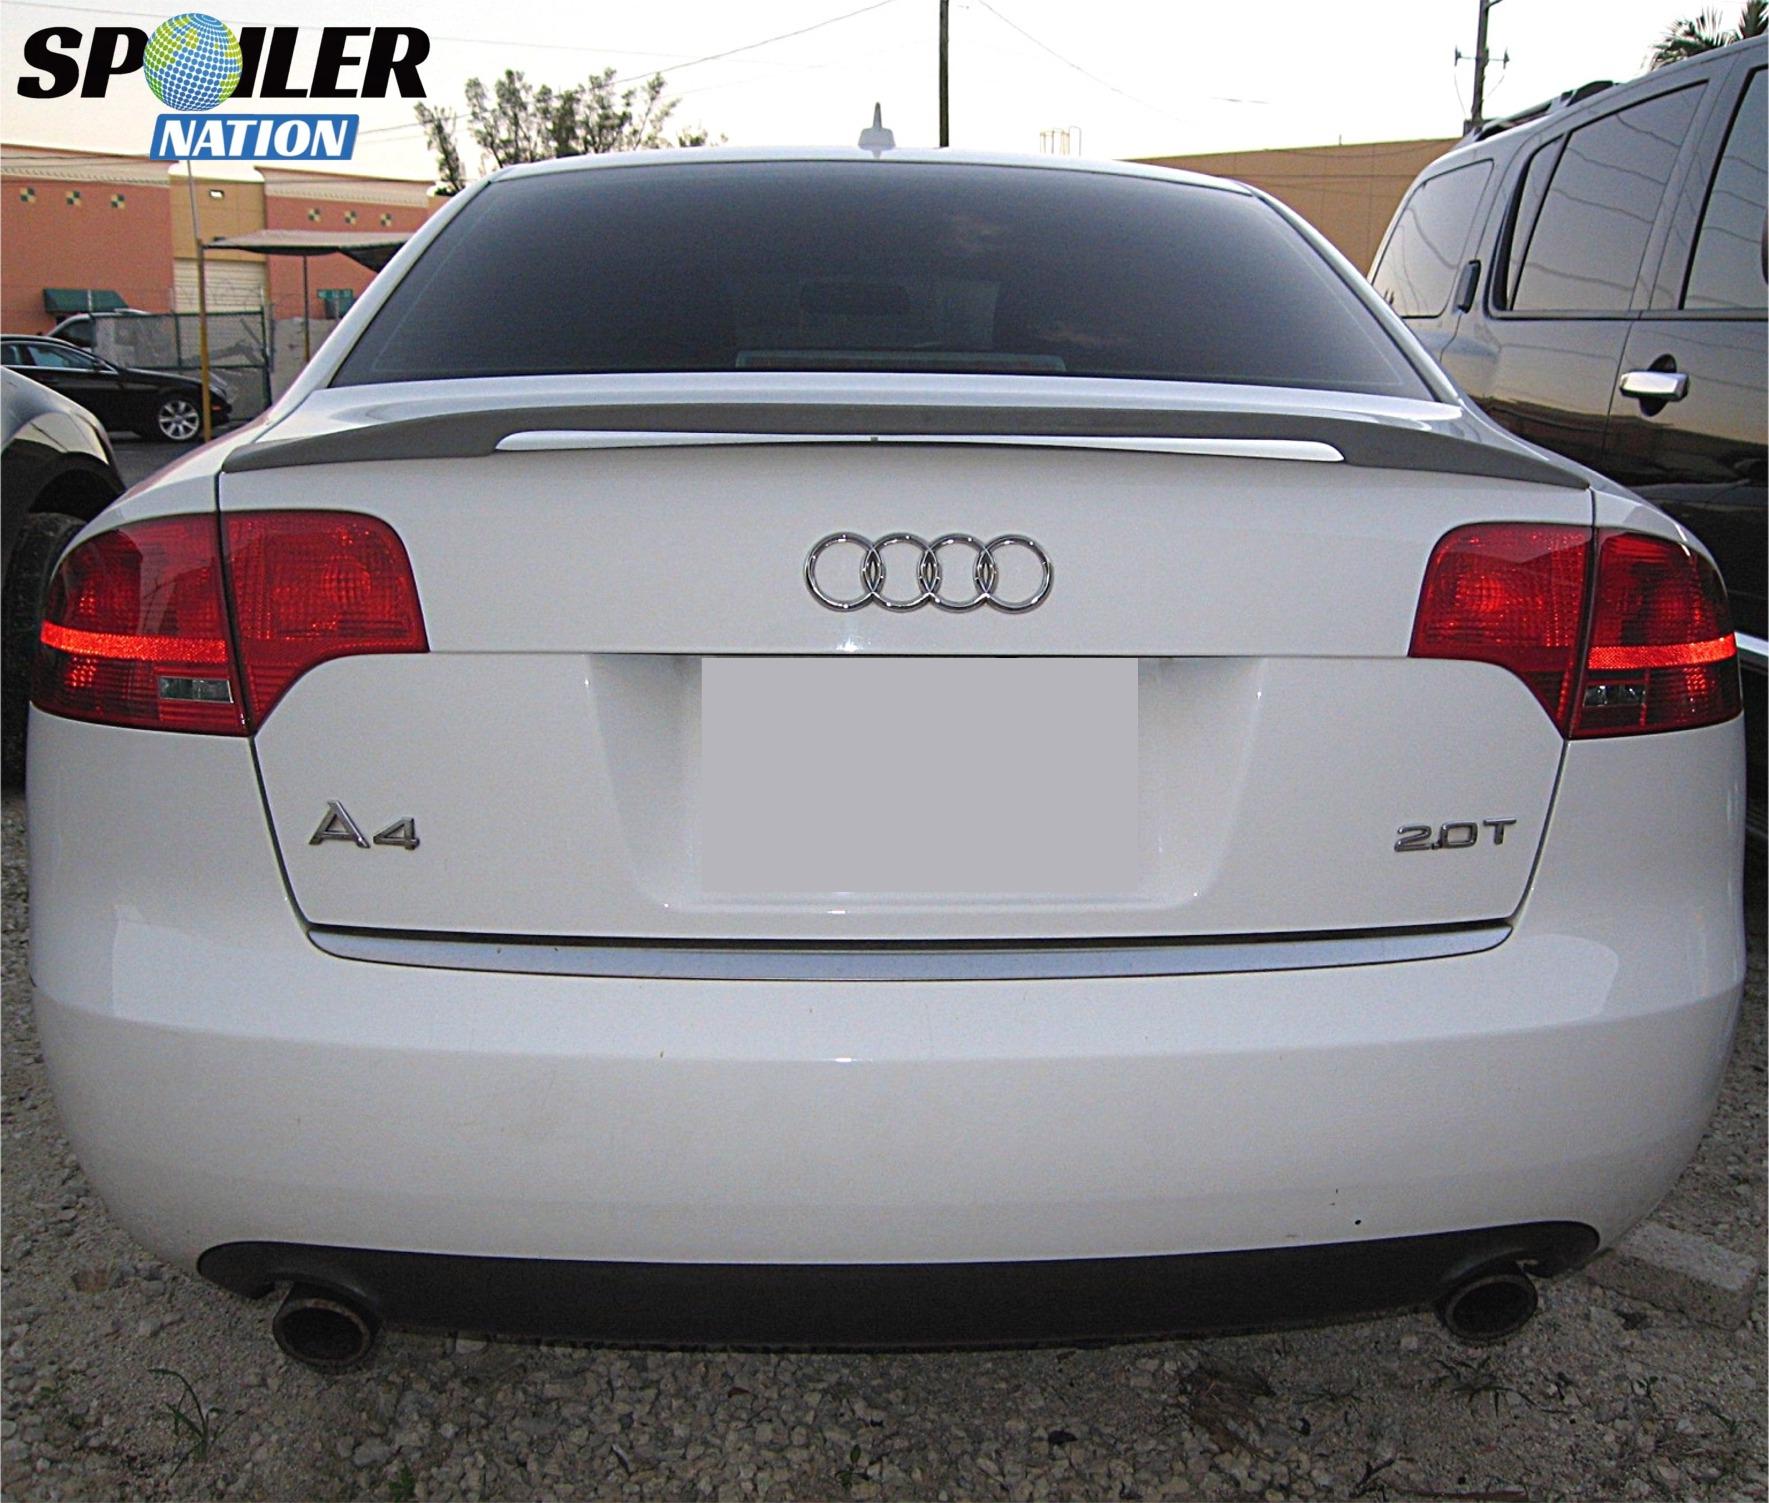 2005 1 2 2008 audi a4 sedan sport style rear wing spoiler rh spoilernation com Audi Rear Deck Lid Spoiler Audi A4 Tuning